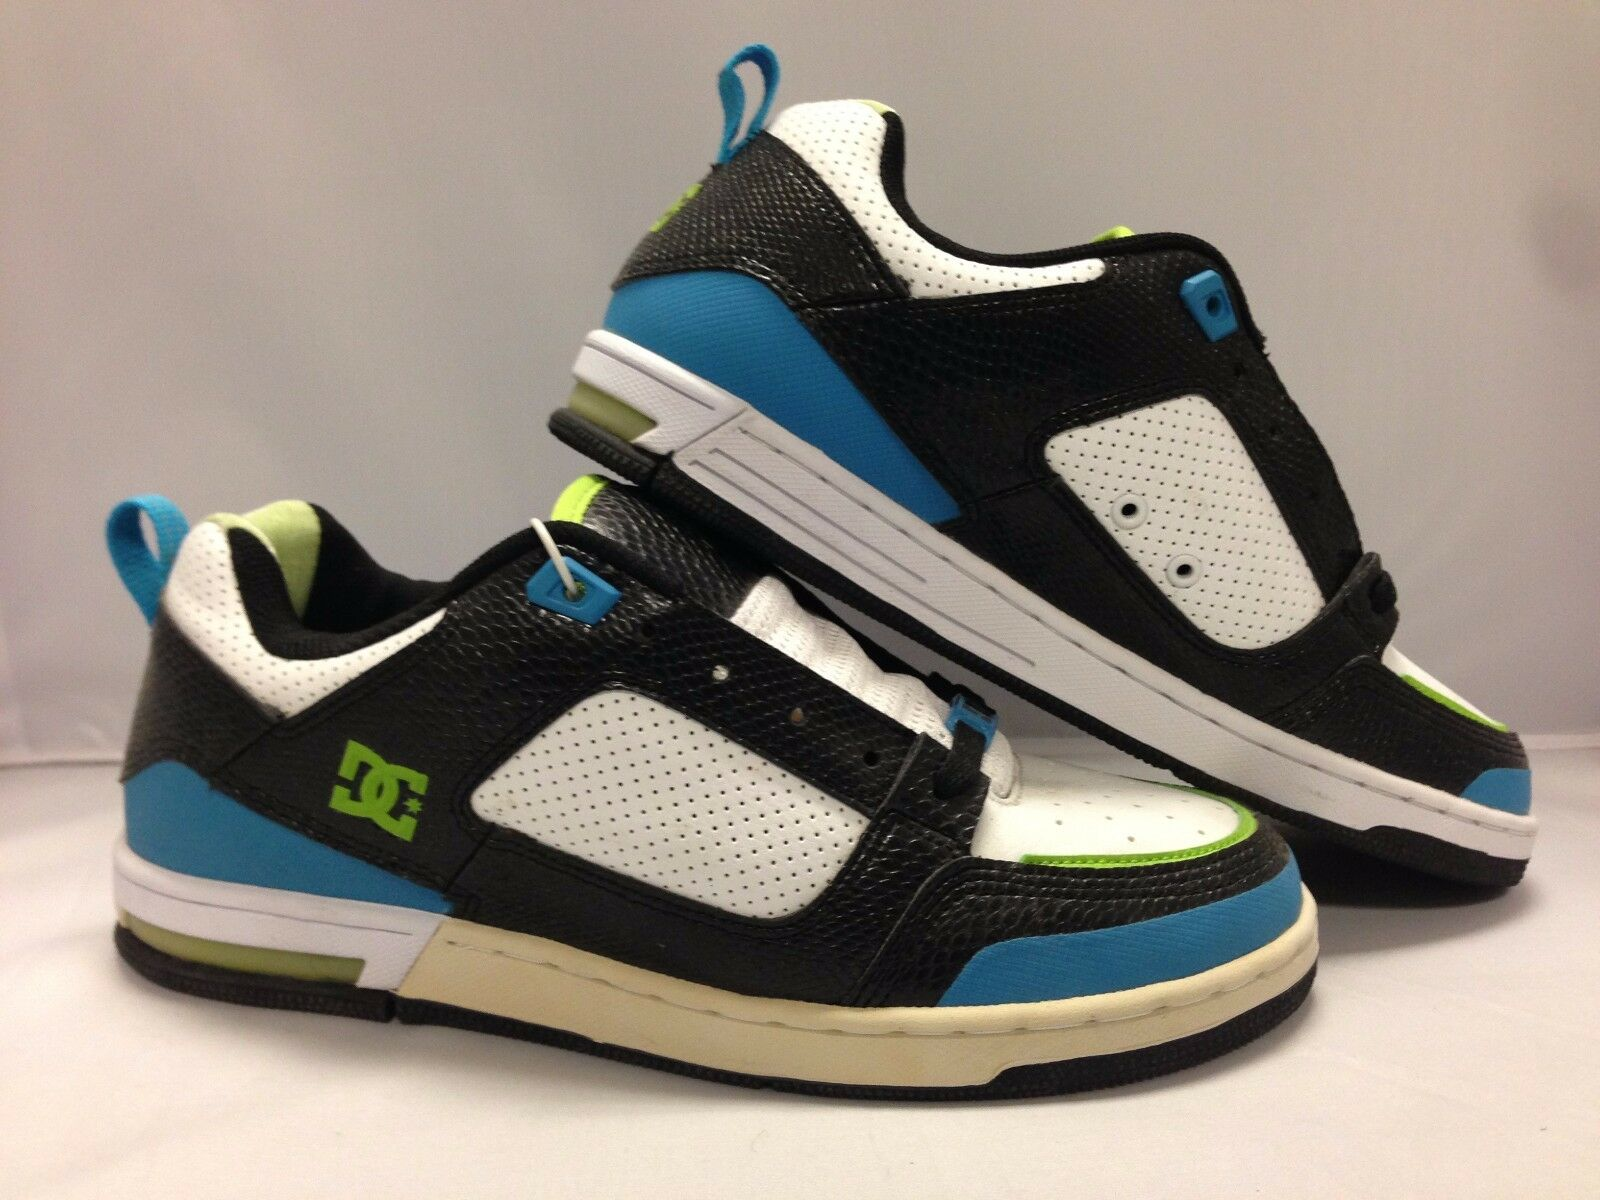 DC Men's shoes ''Premier SN''--Black White Turquoise